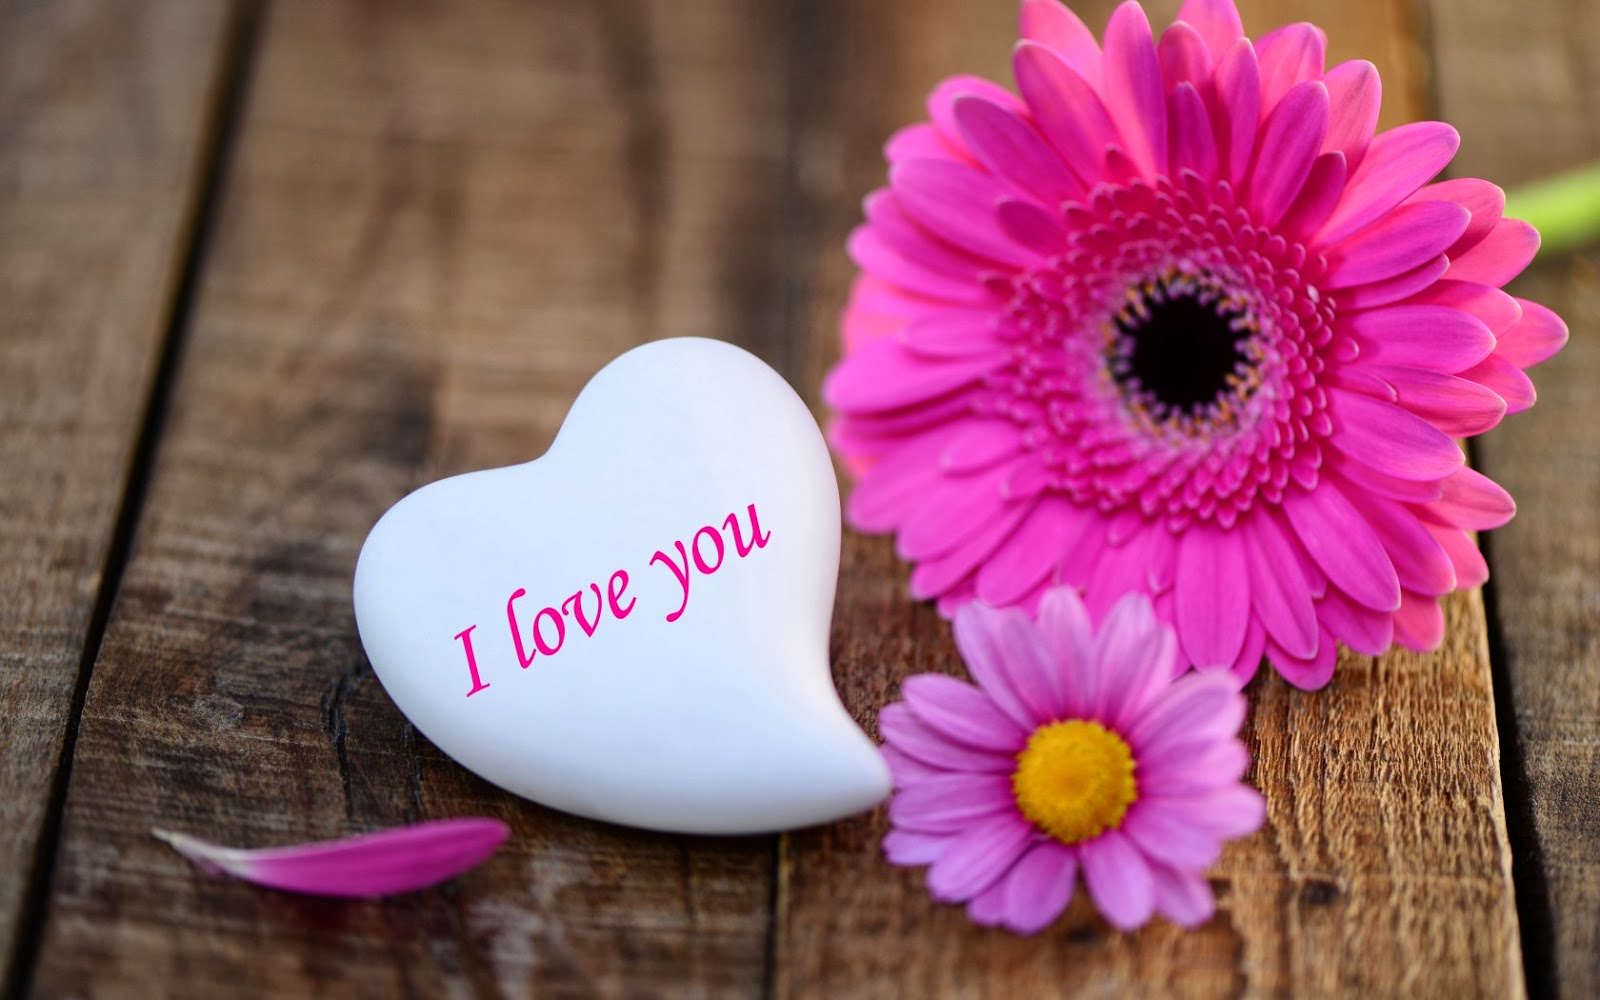 بالصور صور رومانسية صور قلوب حب صور عشاق حب صور قلوب للعشاق , خلفيات رومانسية 3878 6